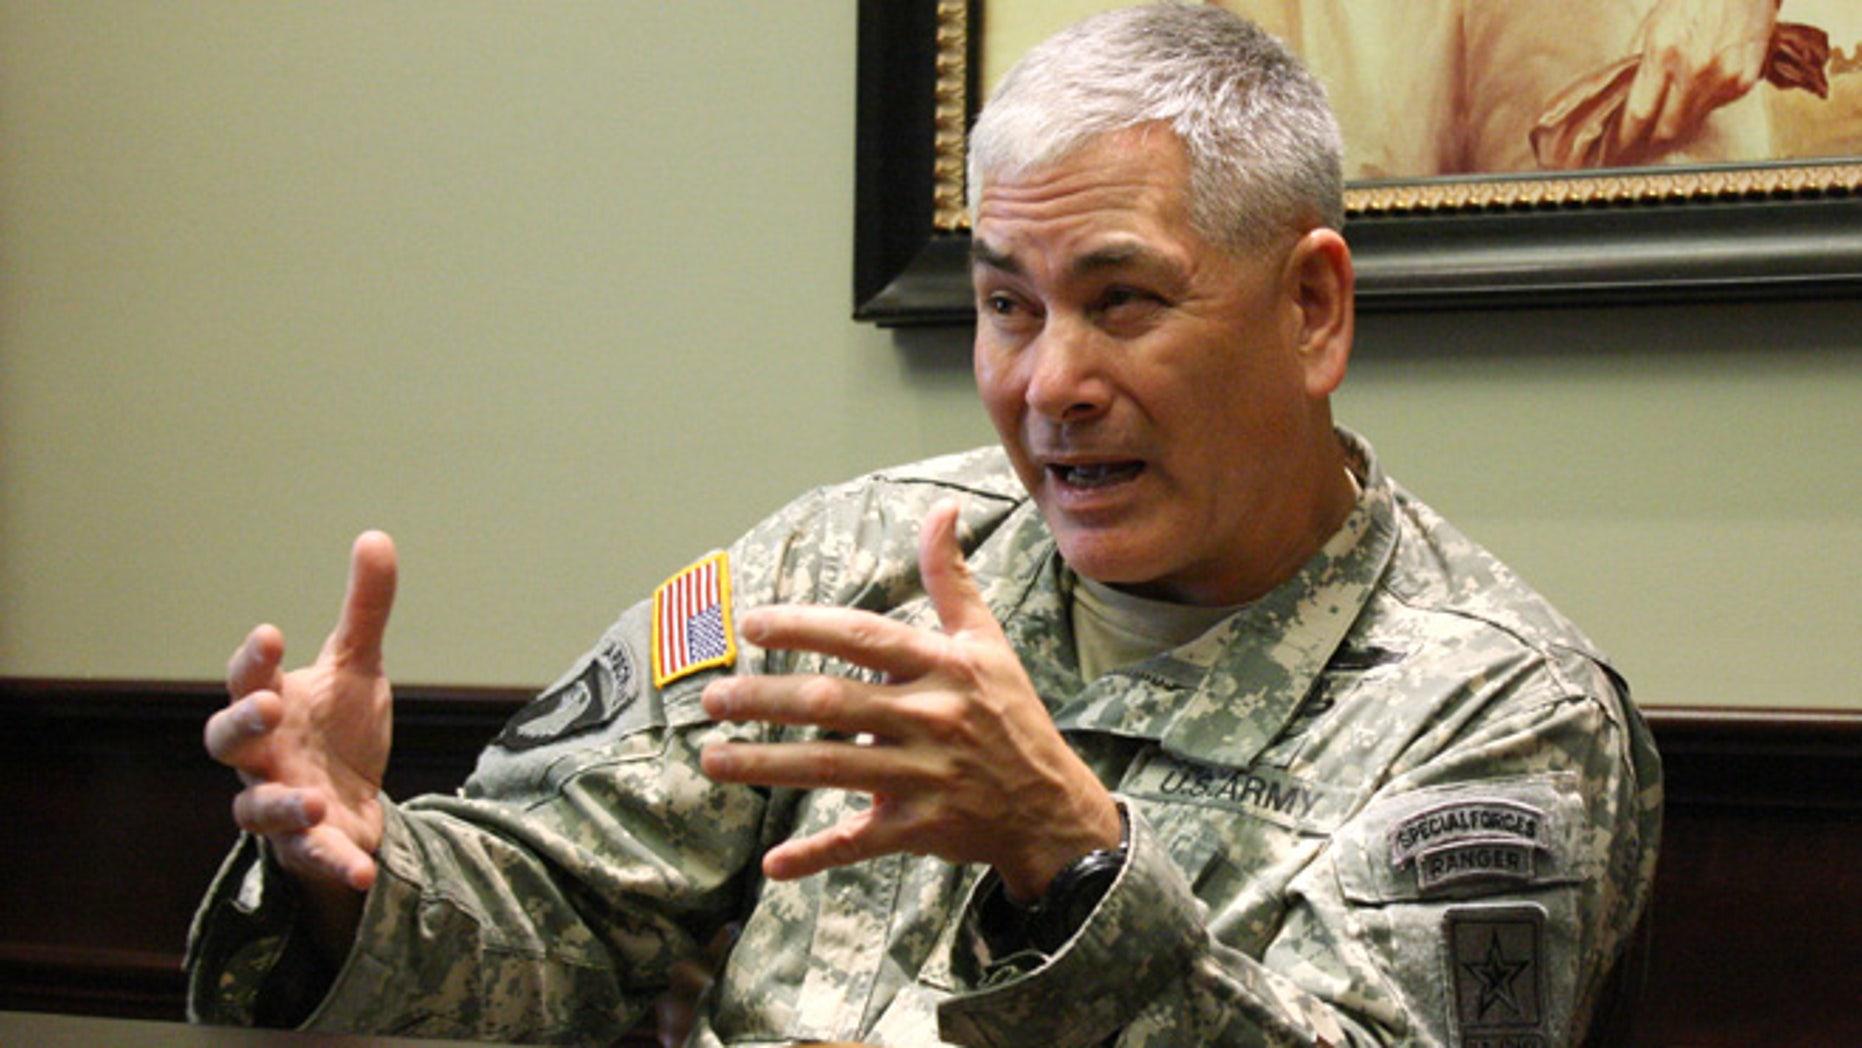 March 18, 2013: File photo, Gen. John Campbell speaks at Fort Leavenworth, Kansas.